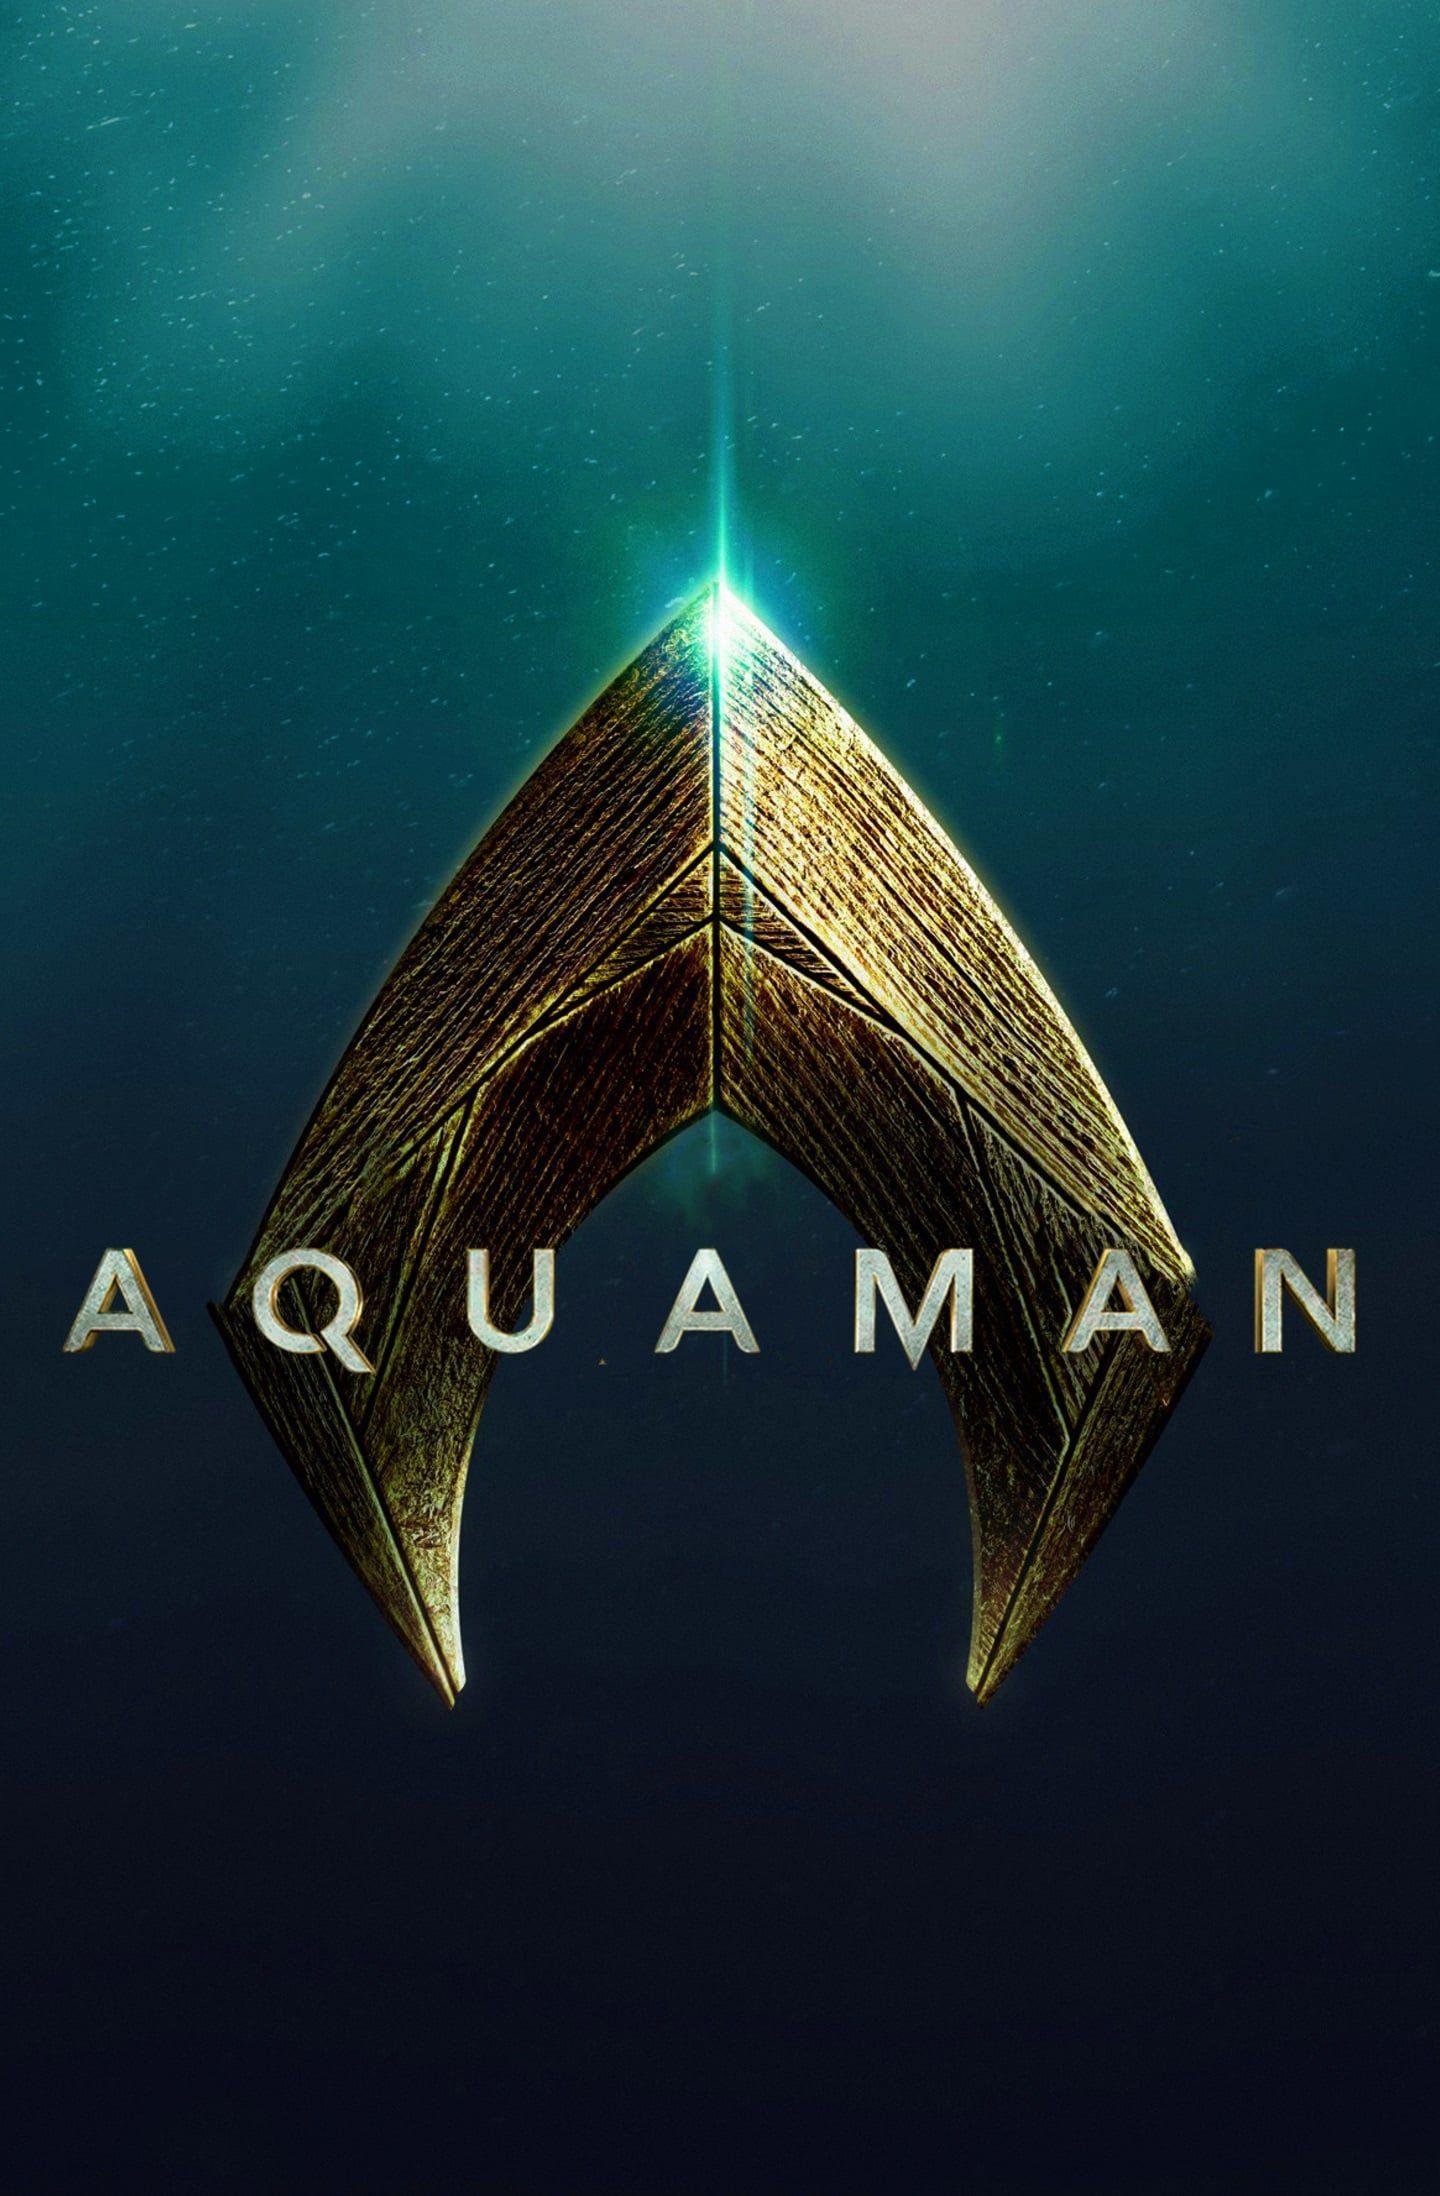 Aquaman Pelicula Completa Español Latiño Hd Subtitulado Full Movies Aquaman Movies Online